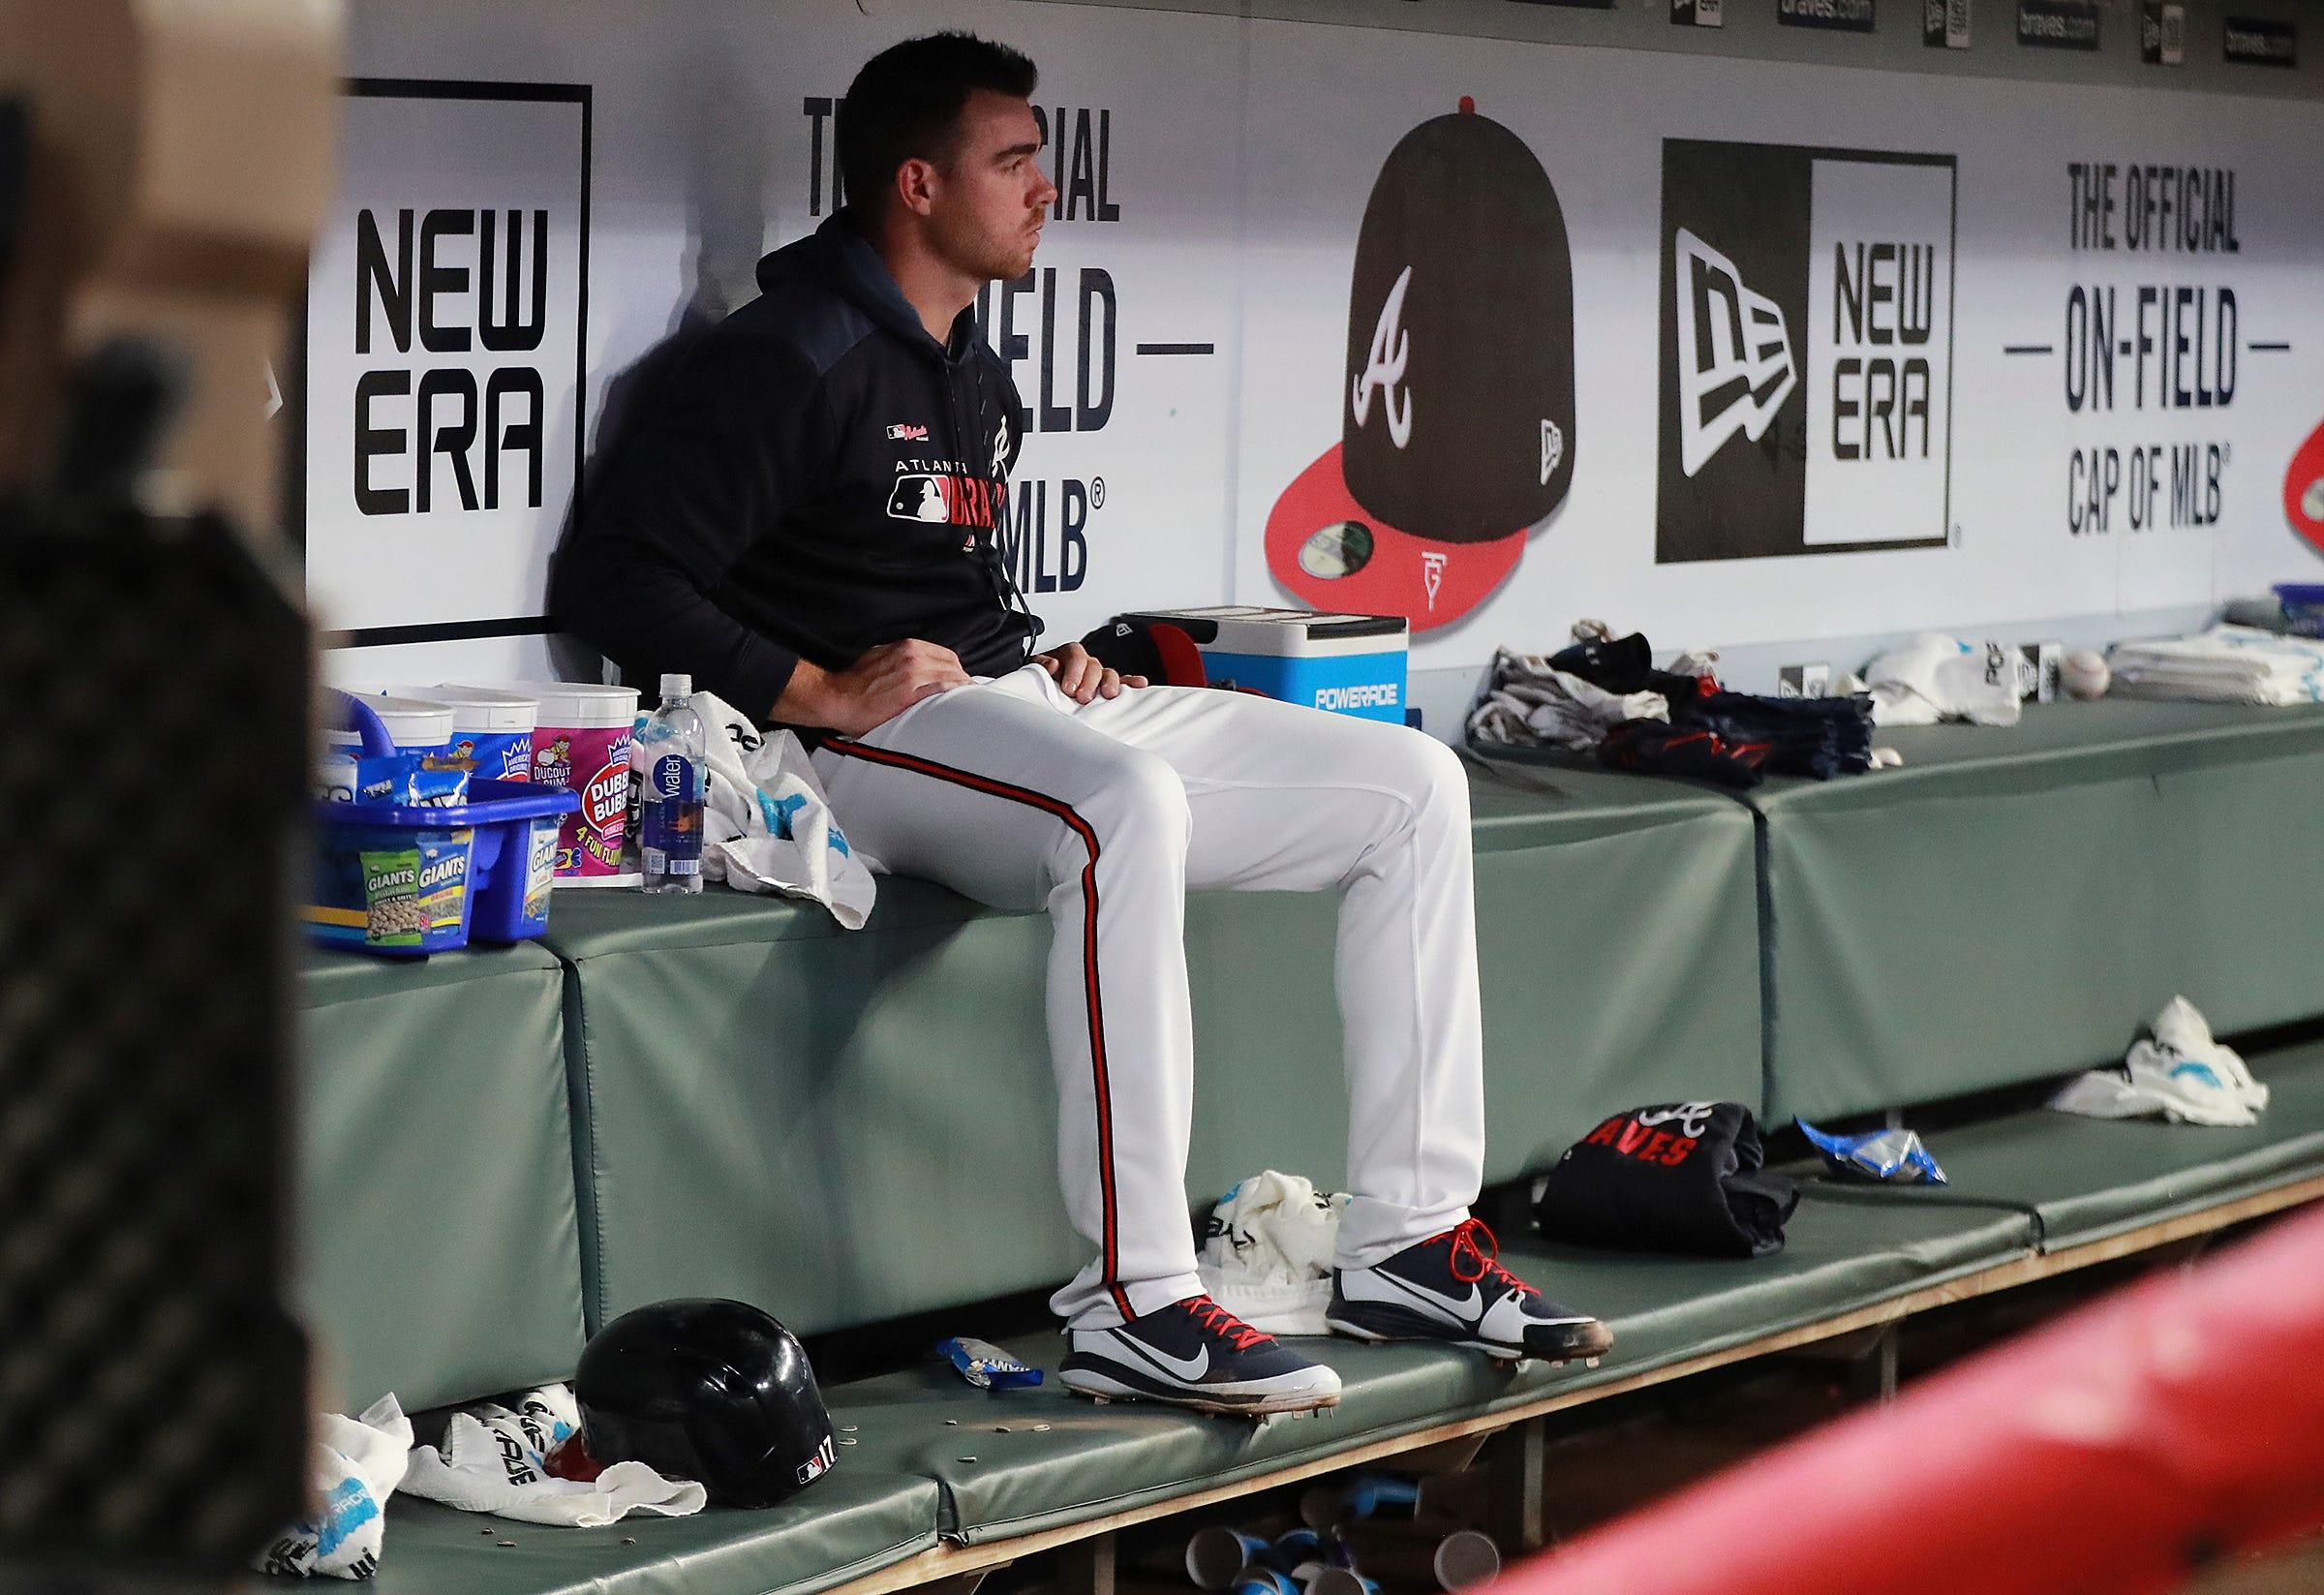 Jones' bases-loaded walk lifts D-backs over Braves 3-2 in 10